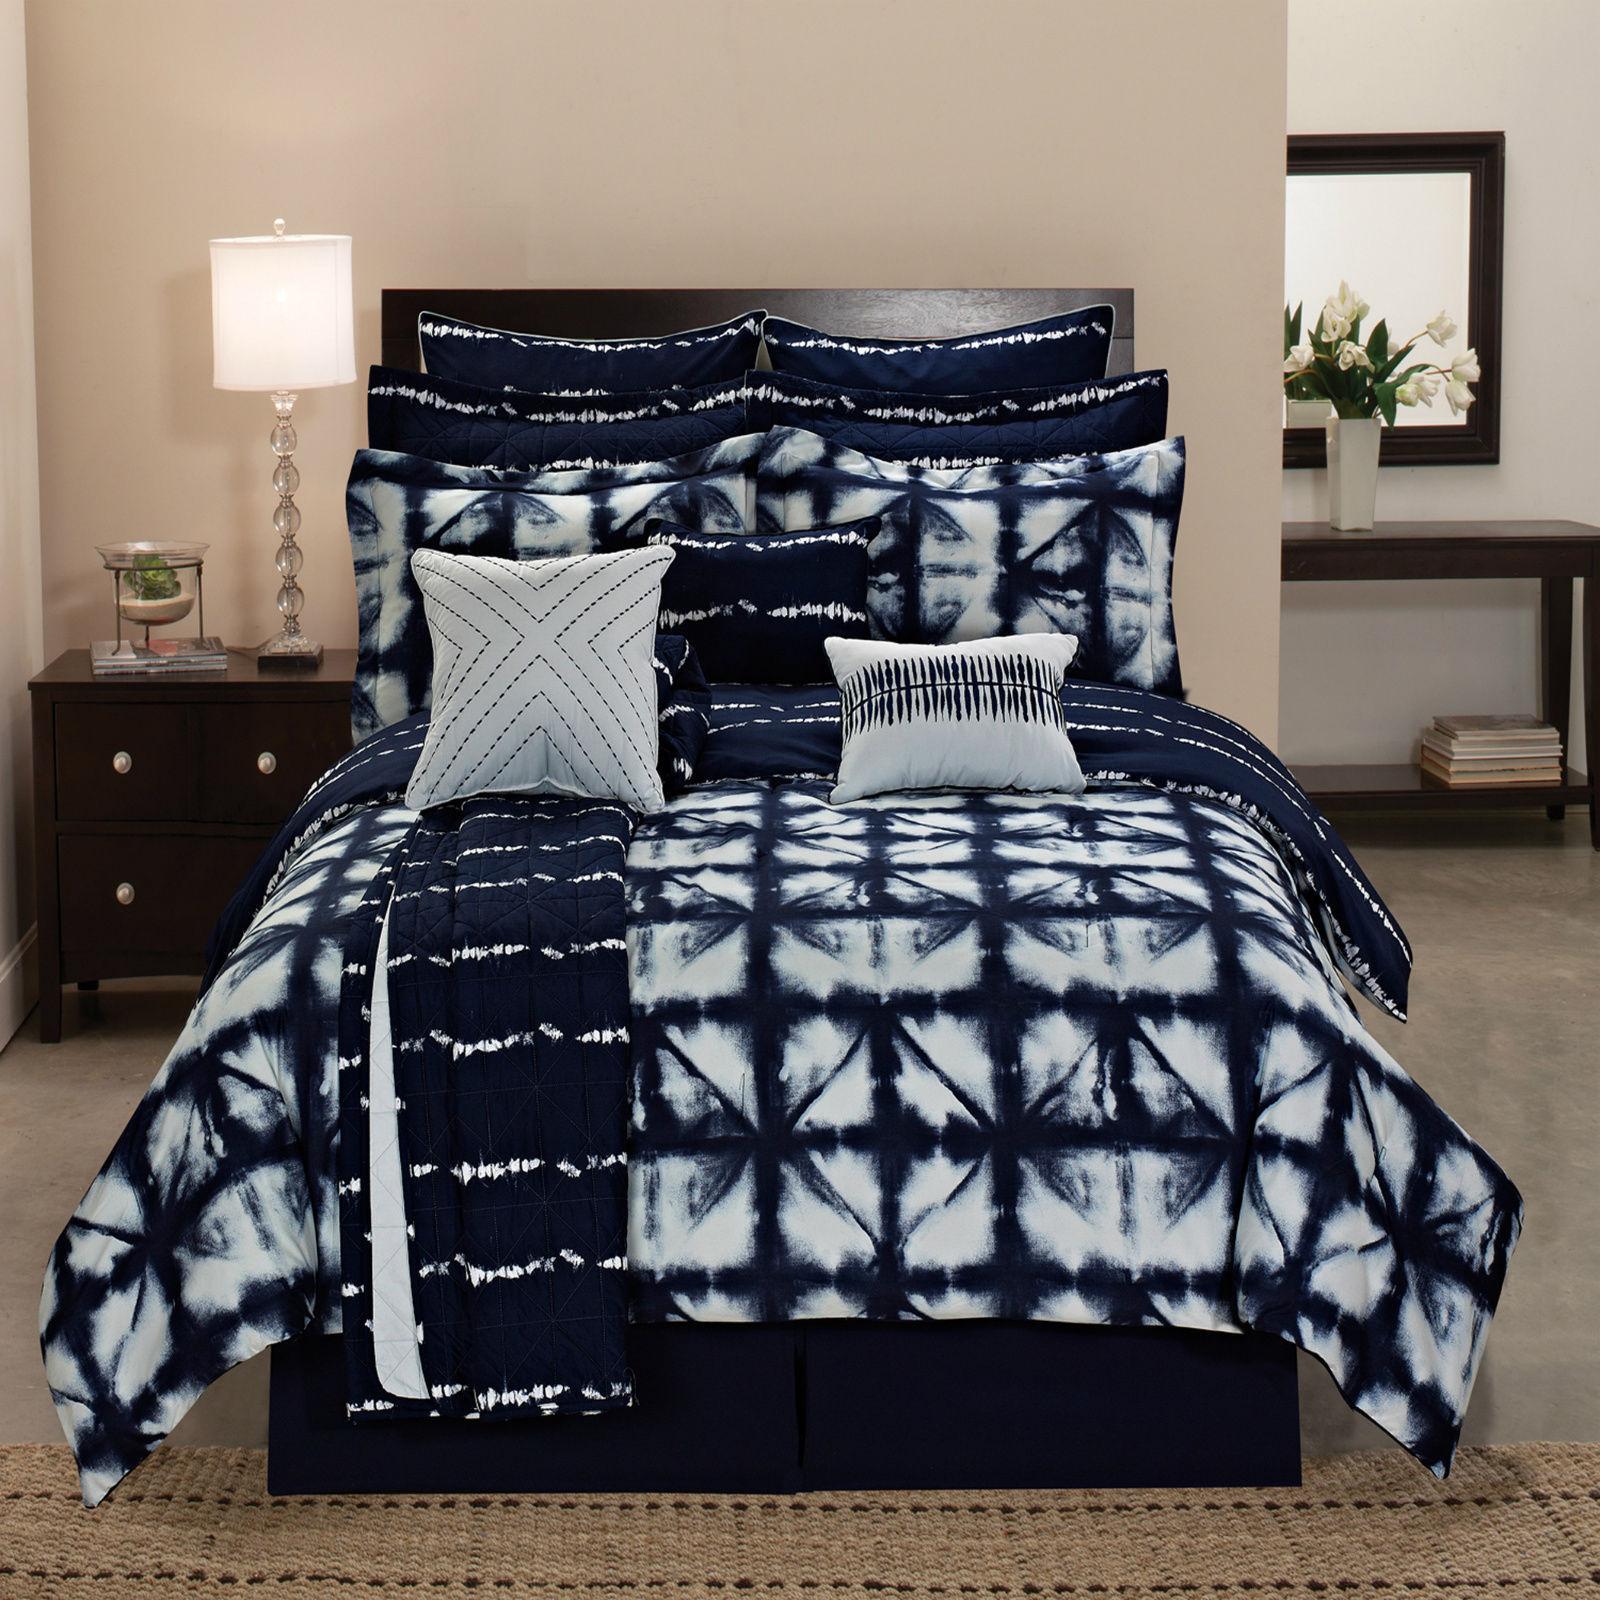 Comforter Sets For Teen Girls Queen Kids Boys King Size